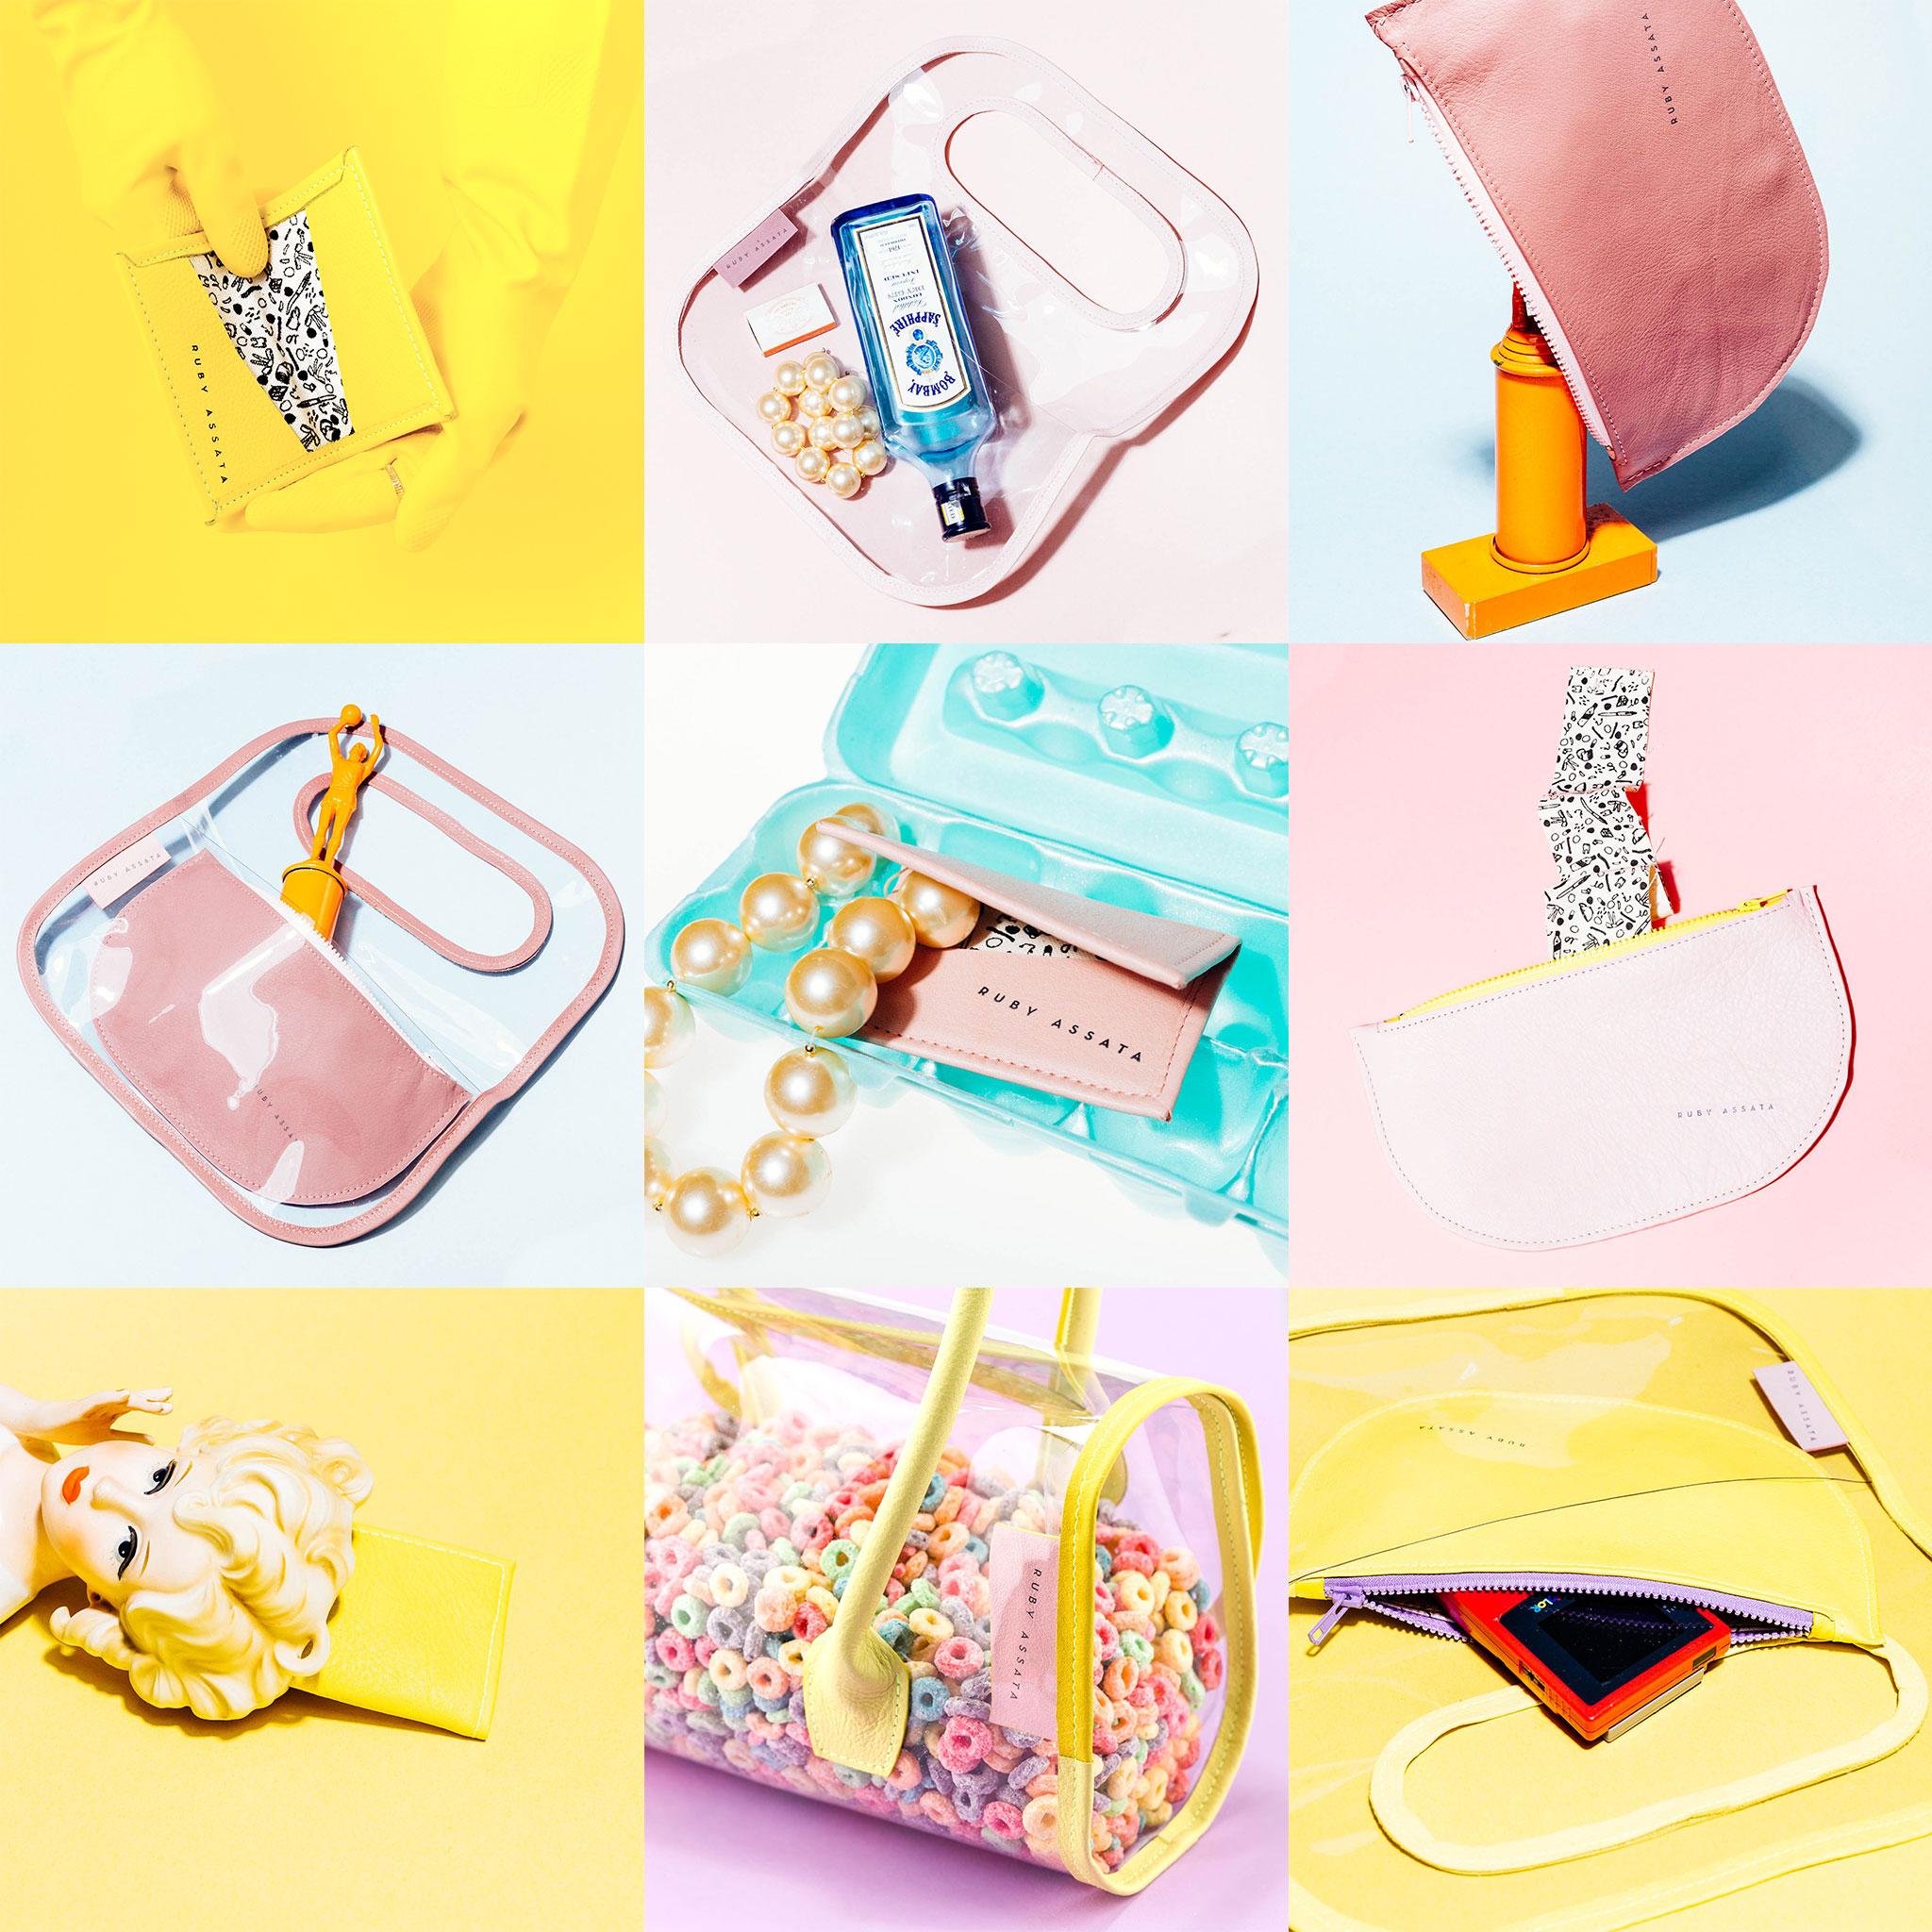 Ruby Assata Handbags Social Media Design by Brand Engine